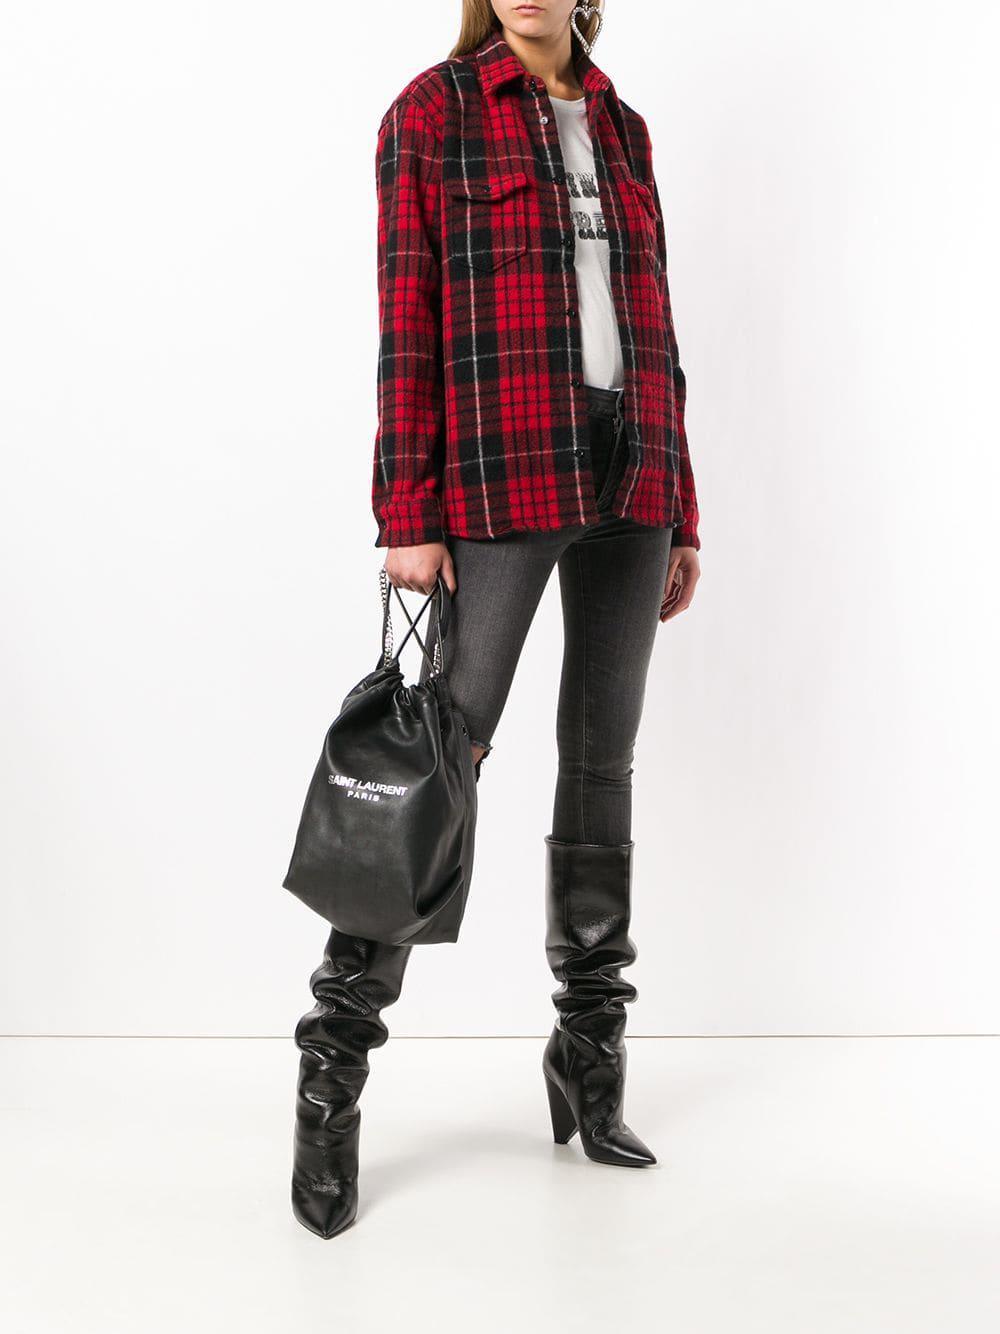 Lyst - Saint Laurent Black Teddy Bucket Bag in Black 114391f267e2c